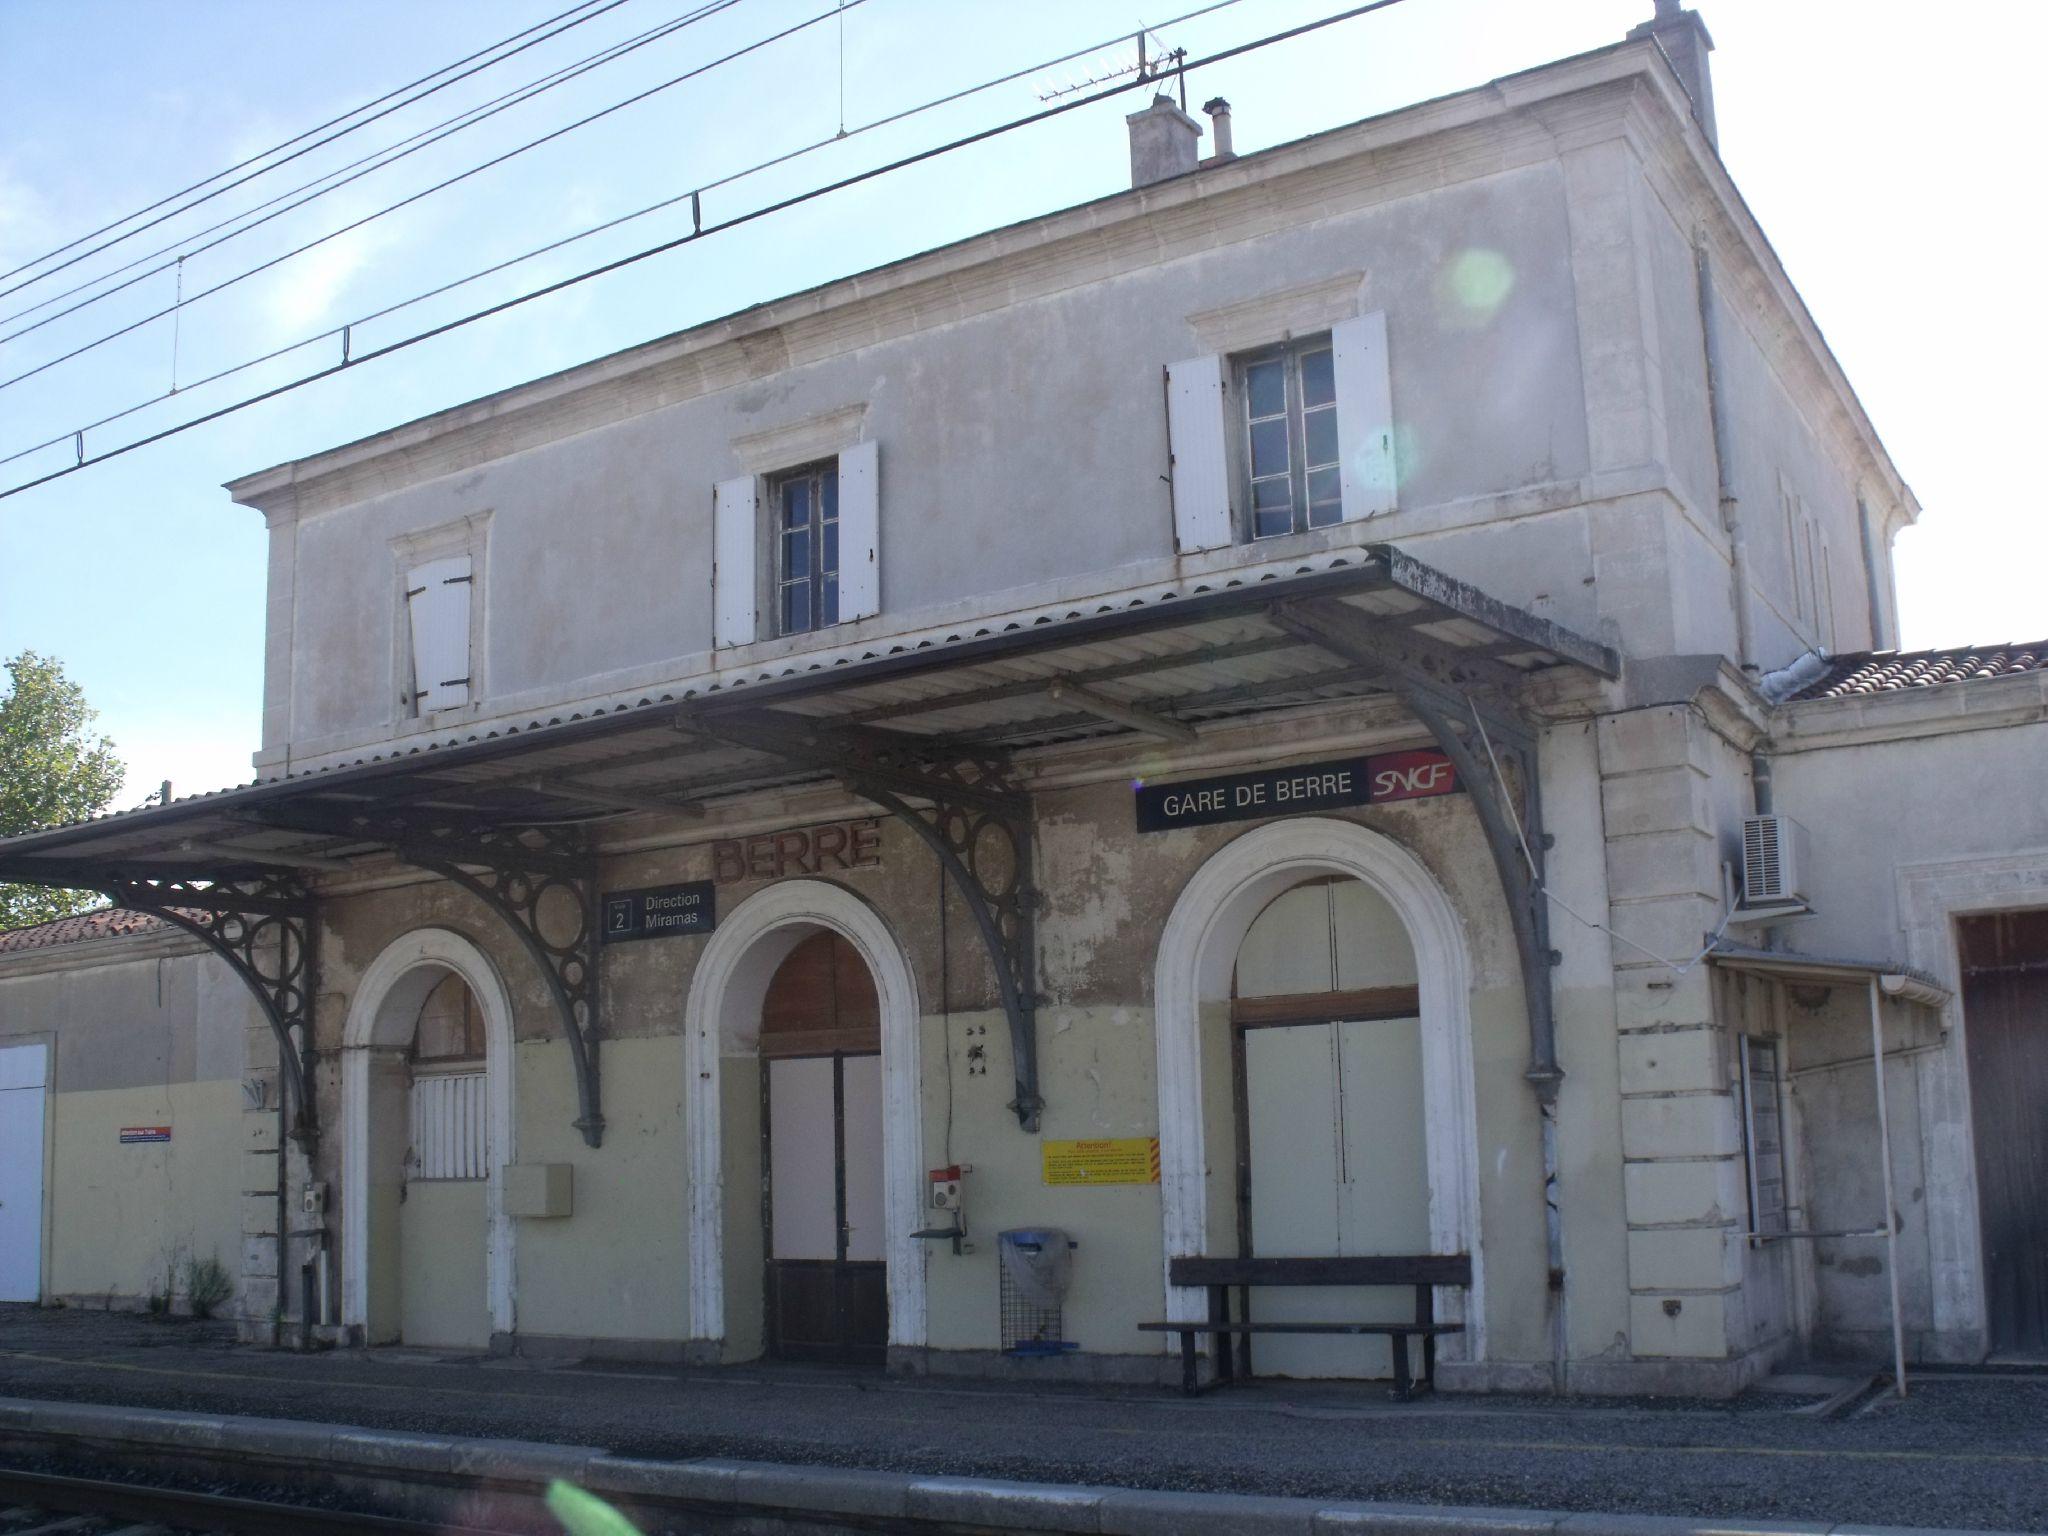 Berre (Bouches-du-Rhône - 13) 2